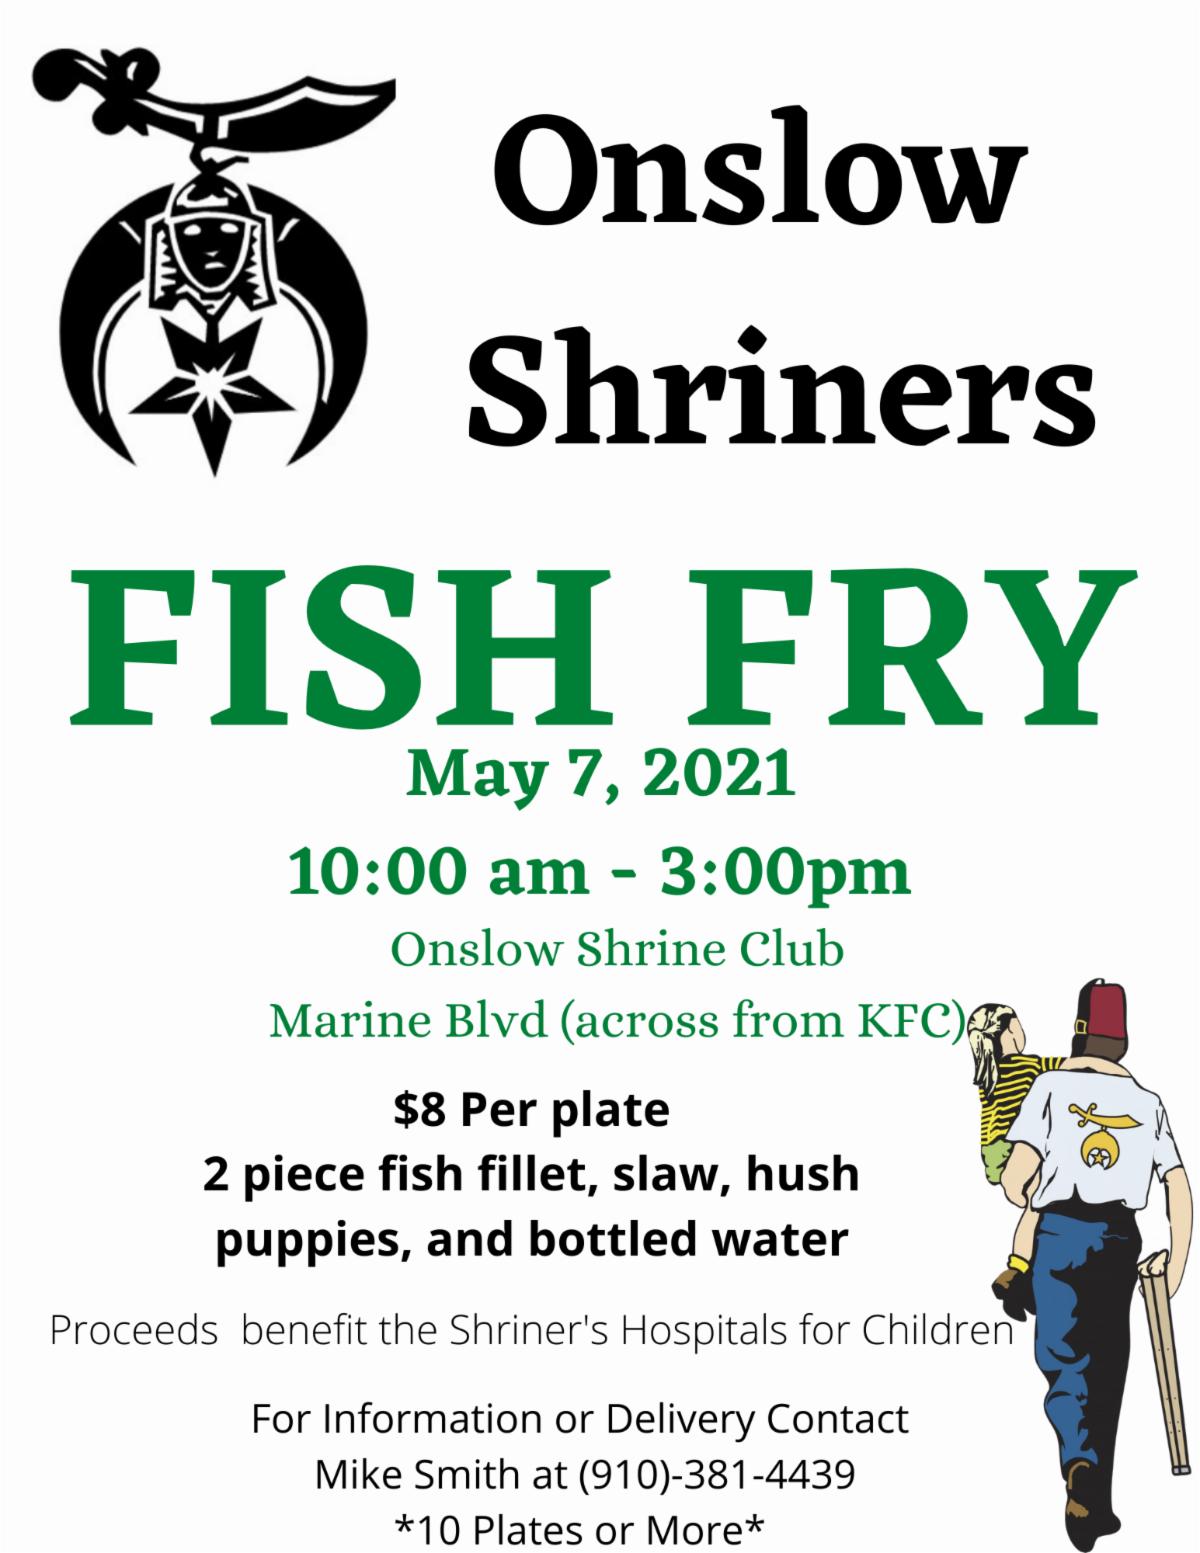 Onslow Shriner's Fish Fry